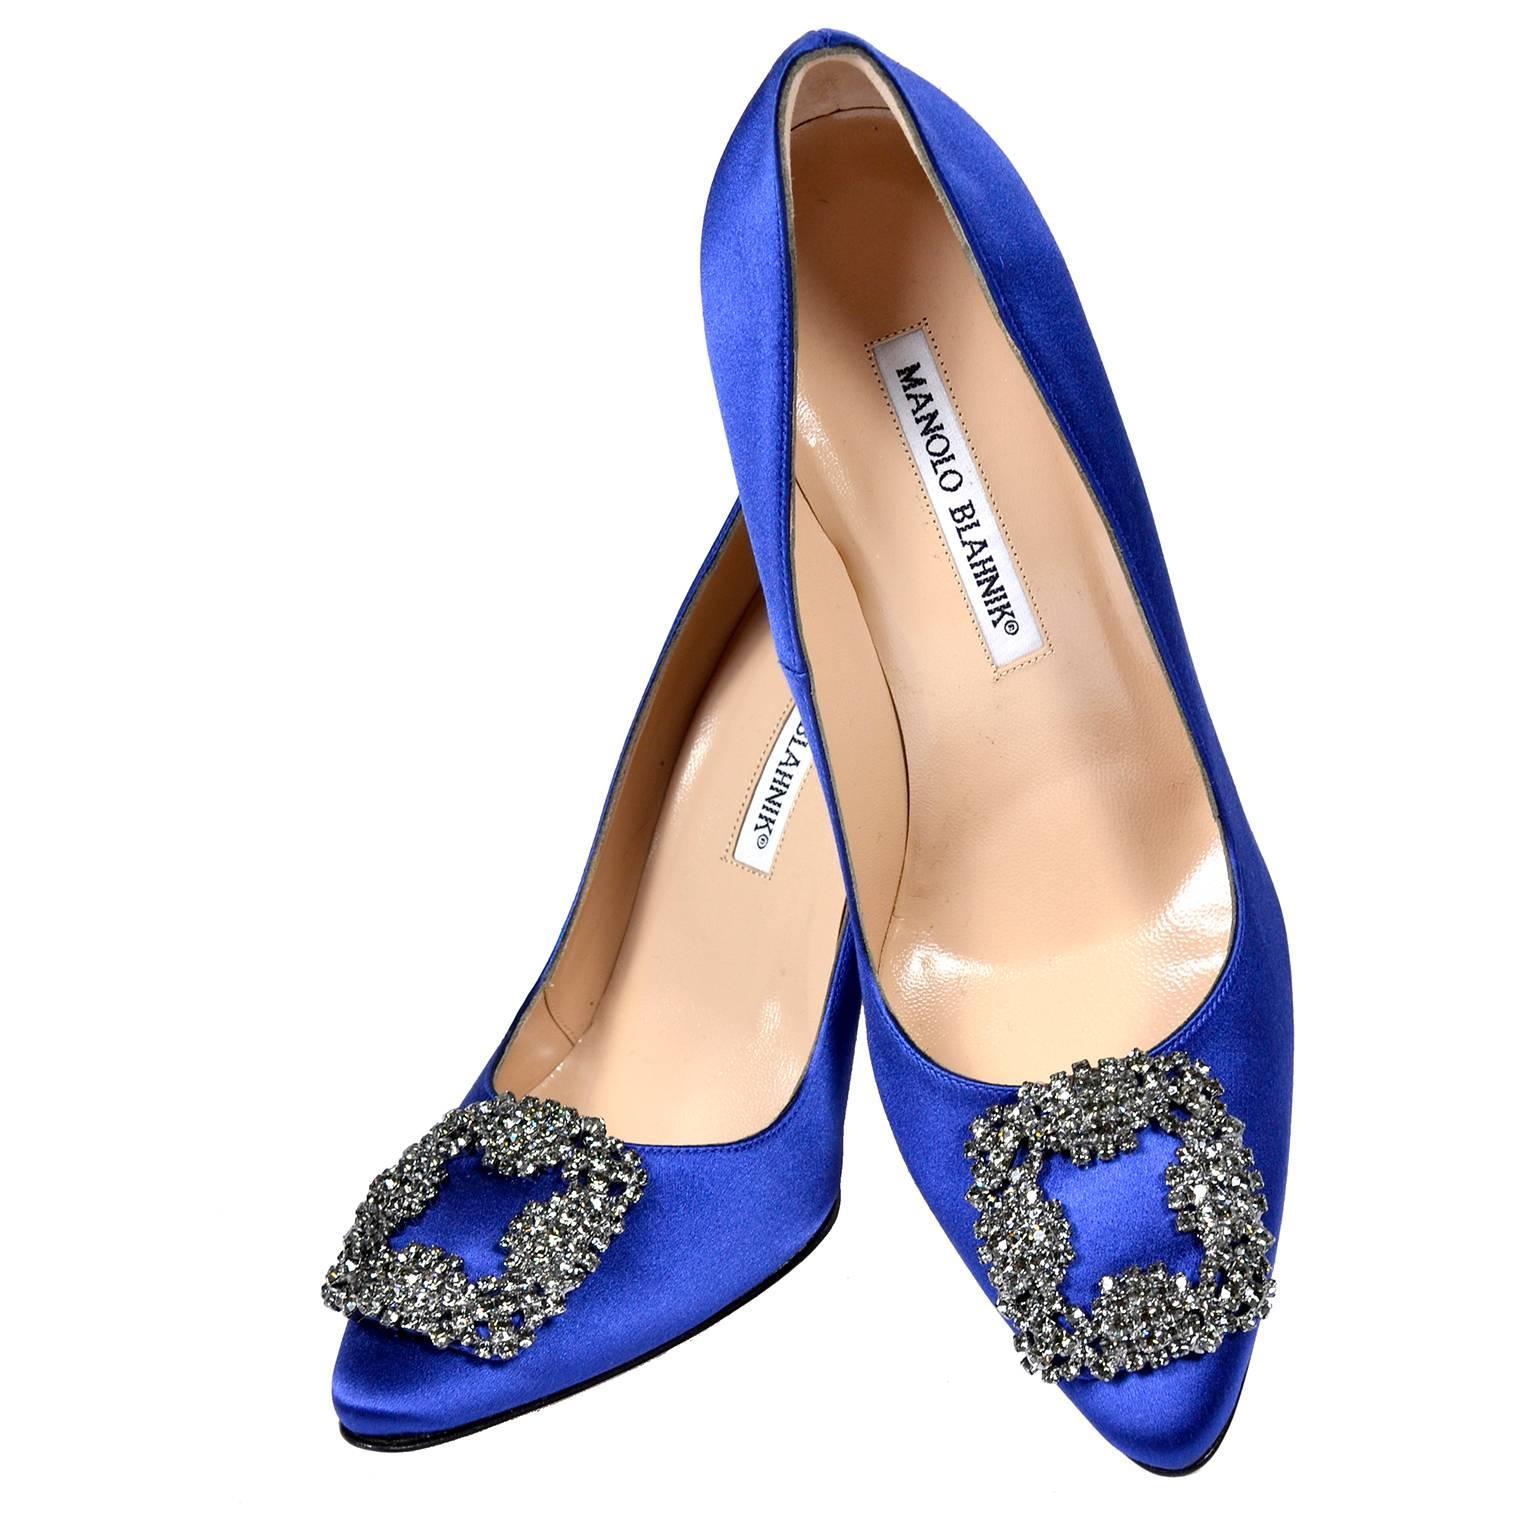 new manolo blahnik carrie bradshaw blue satin shoes lanza heels in box 375